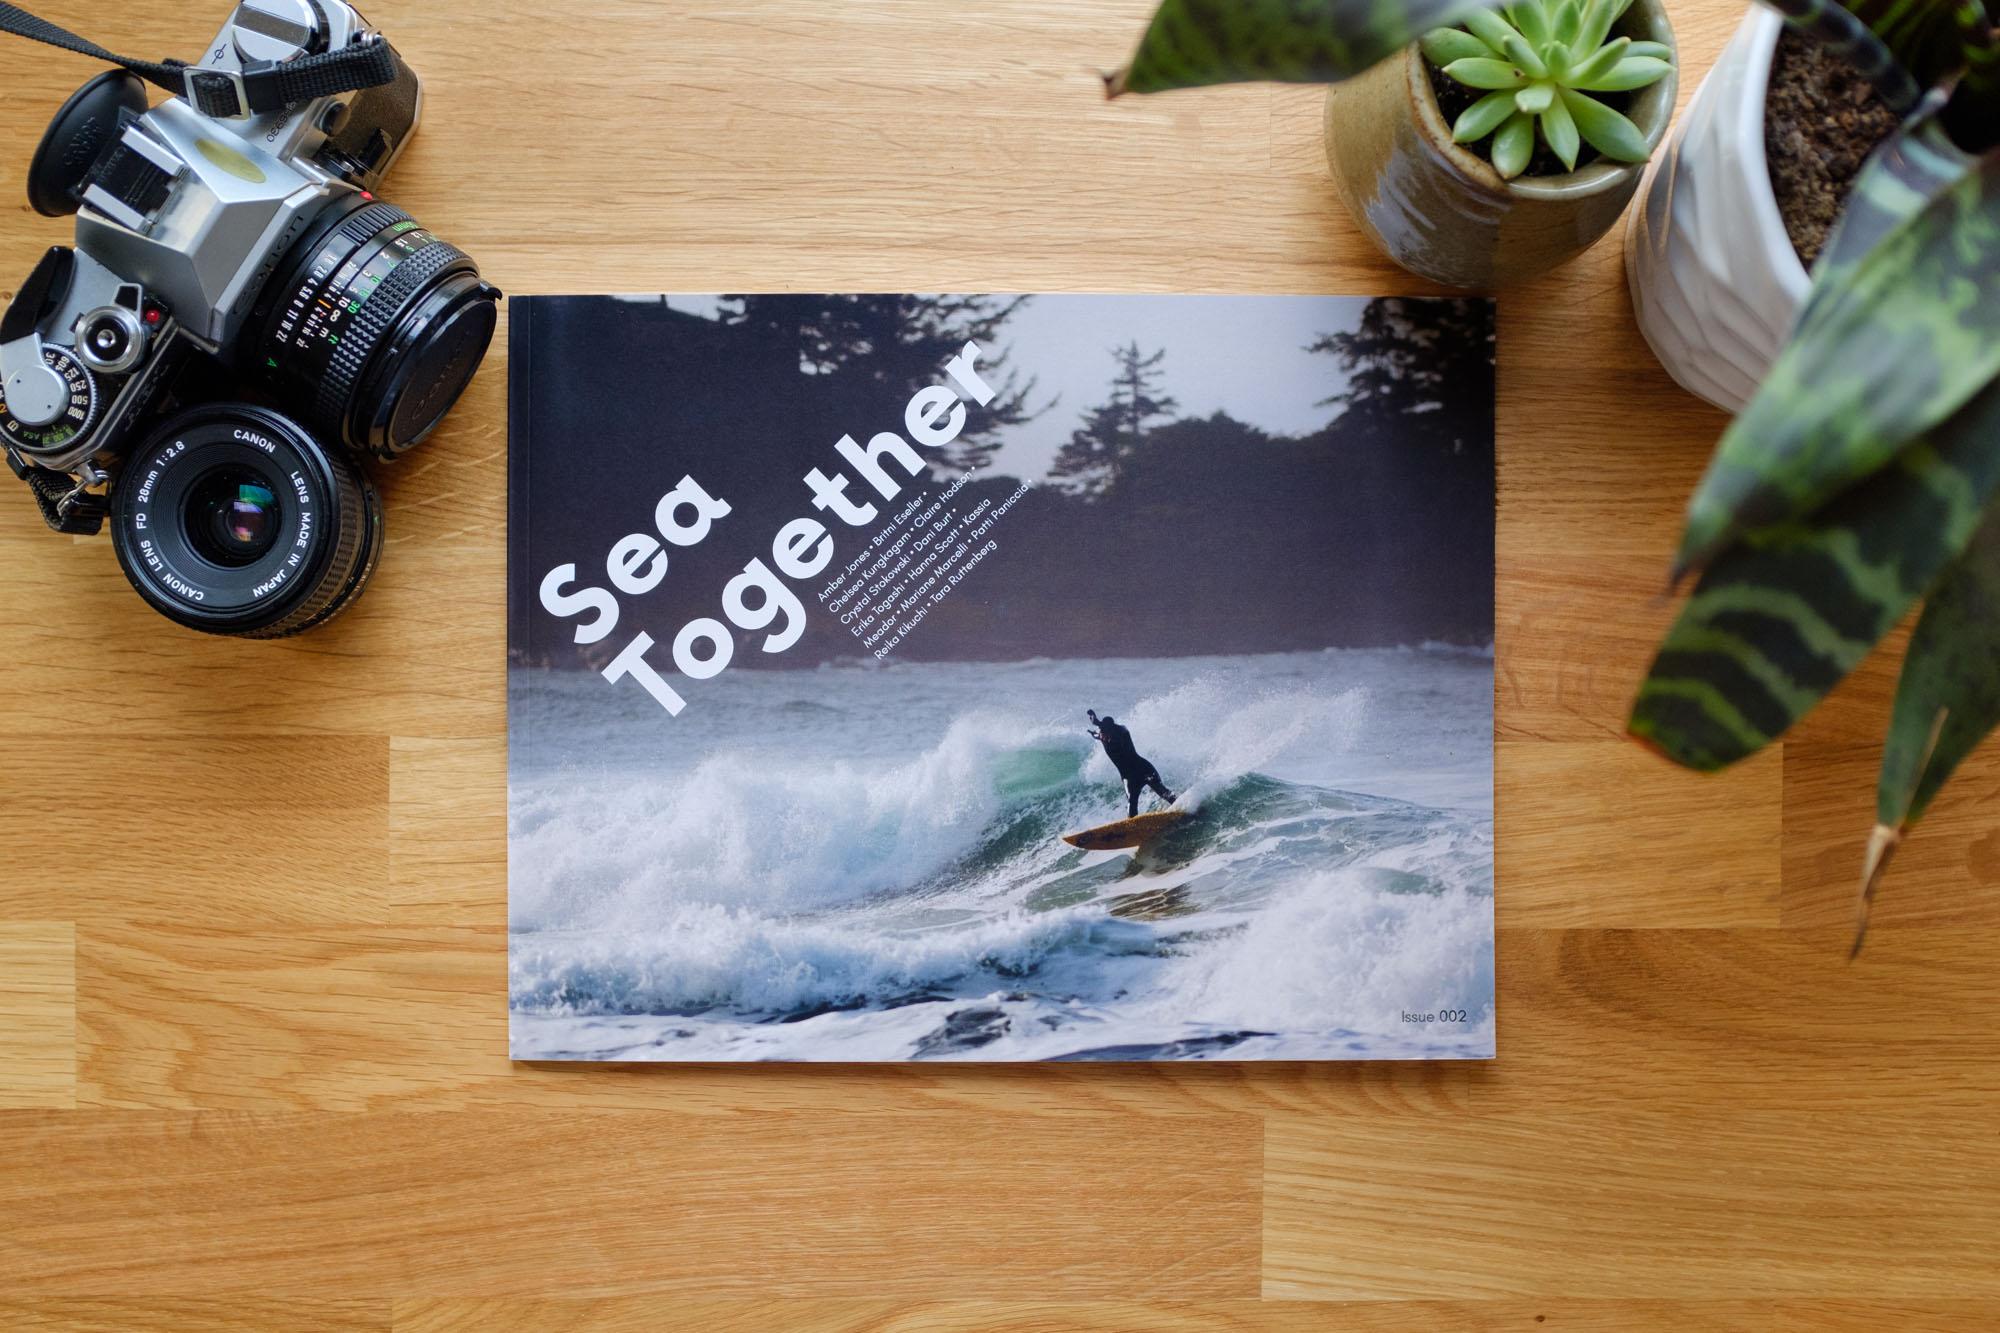 DSCF8713_sea-together-issue-002_20190601.jpg